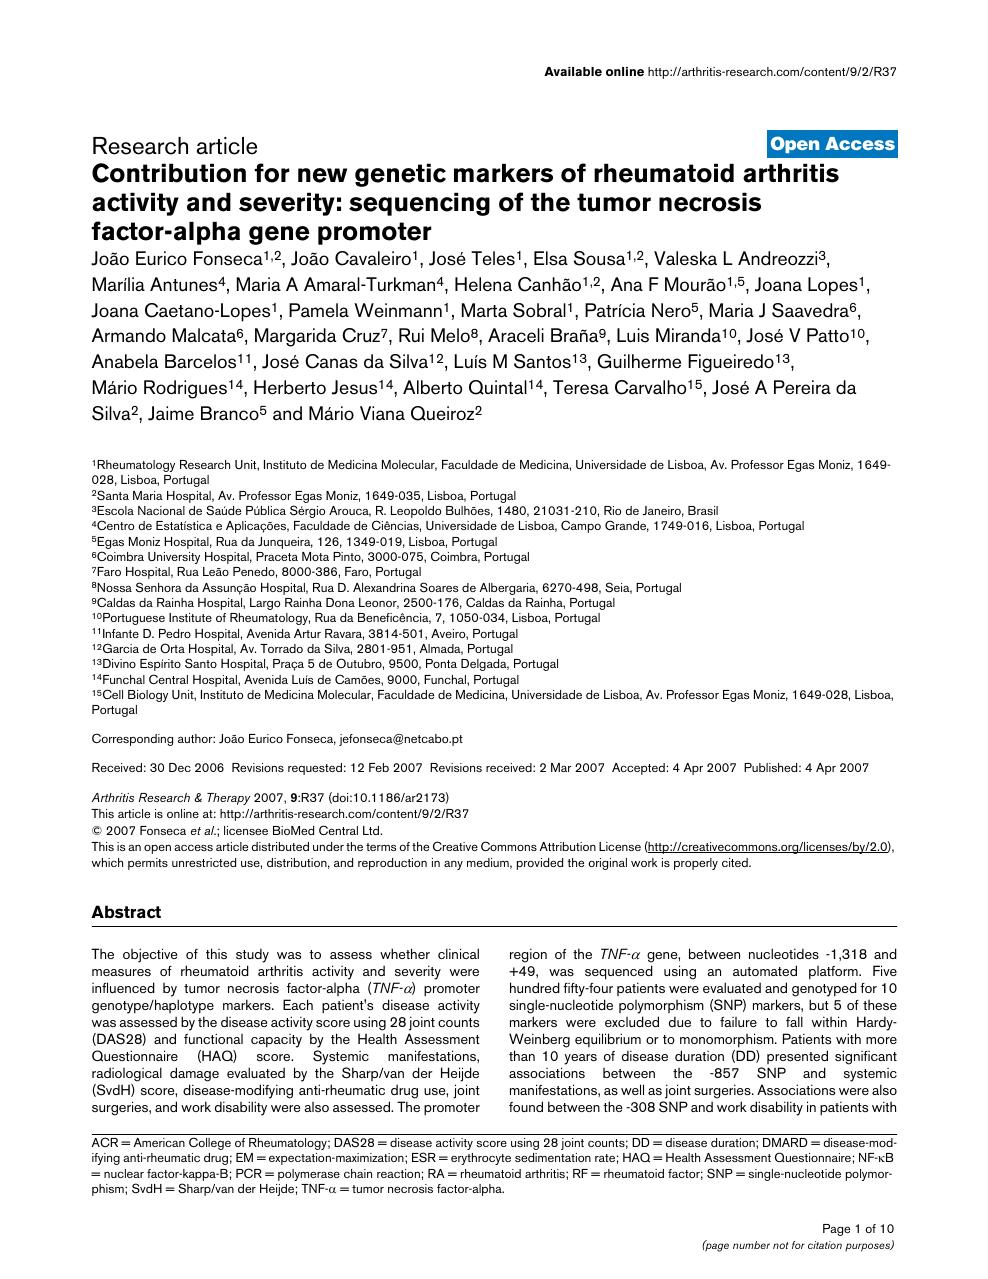 rheumatoid arthritis research paper